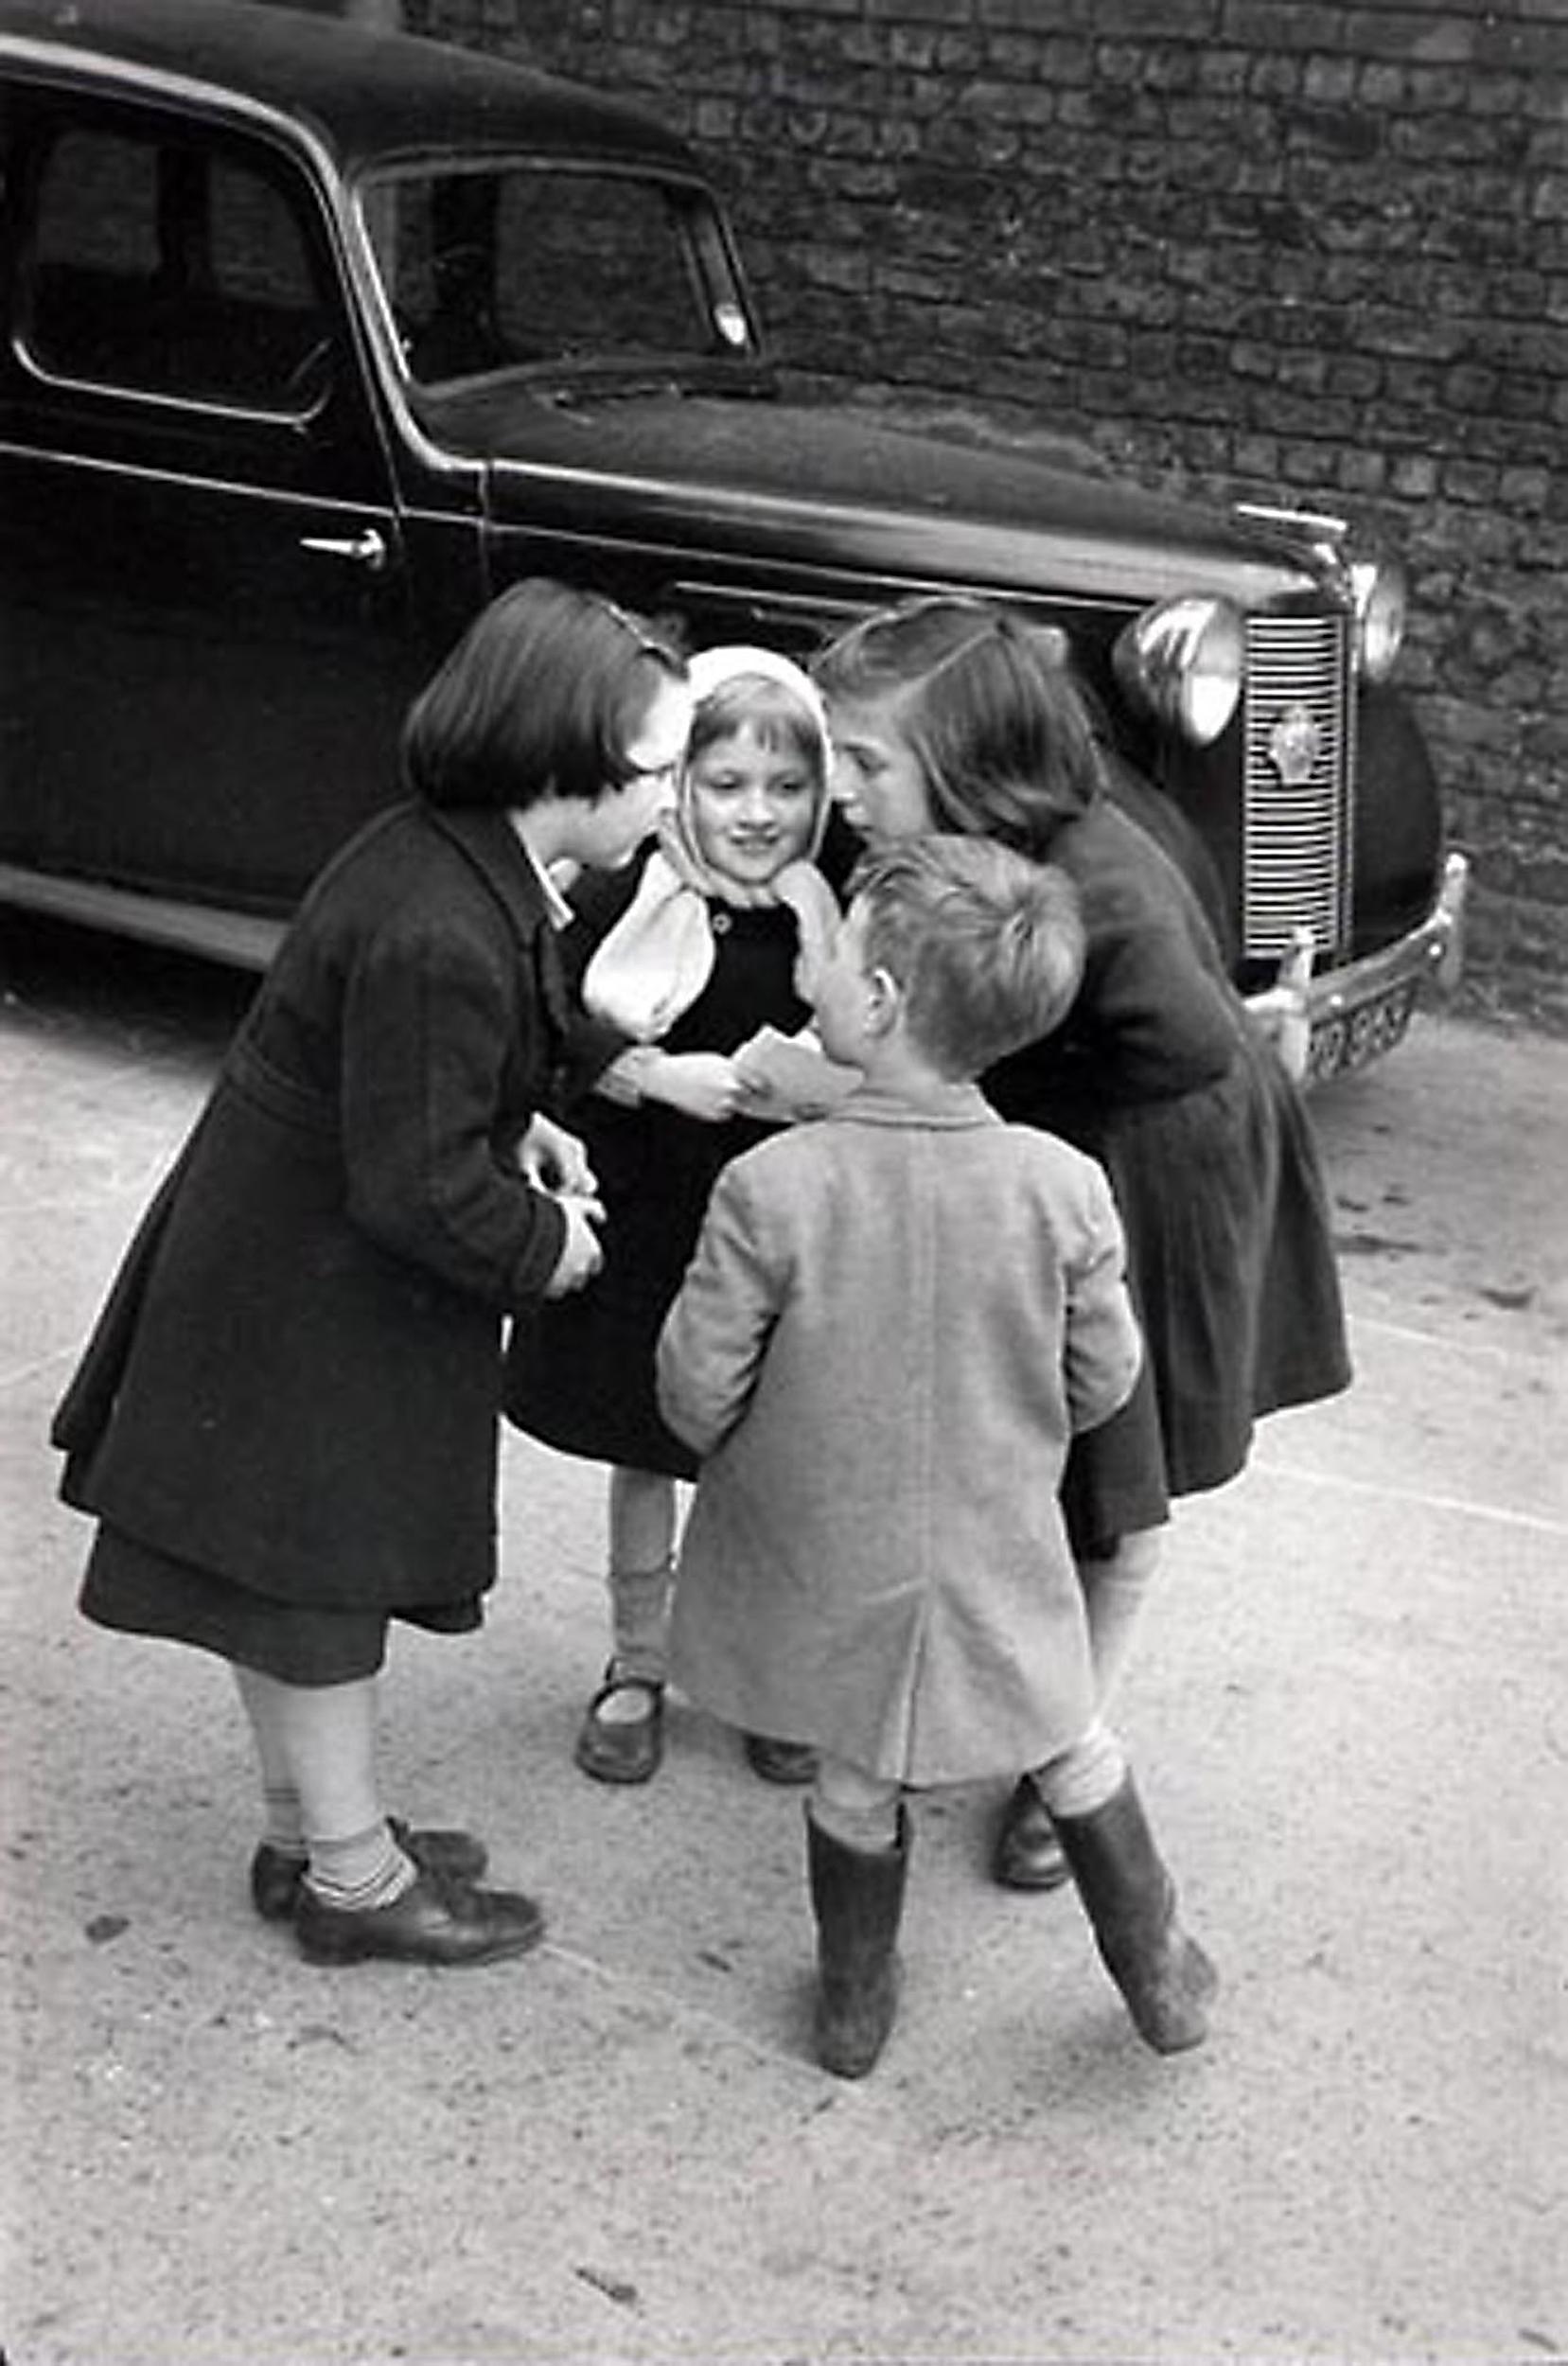 HANNON_three_girls_and_boy_(dublin)_1957_11x14_high.jpg